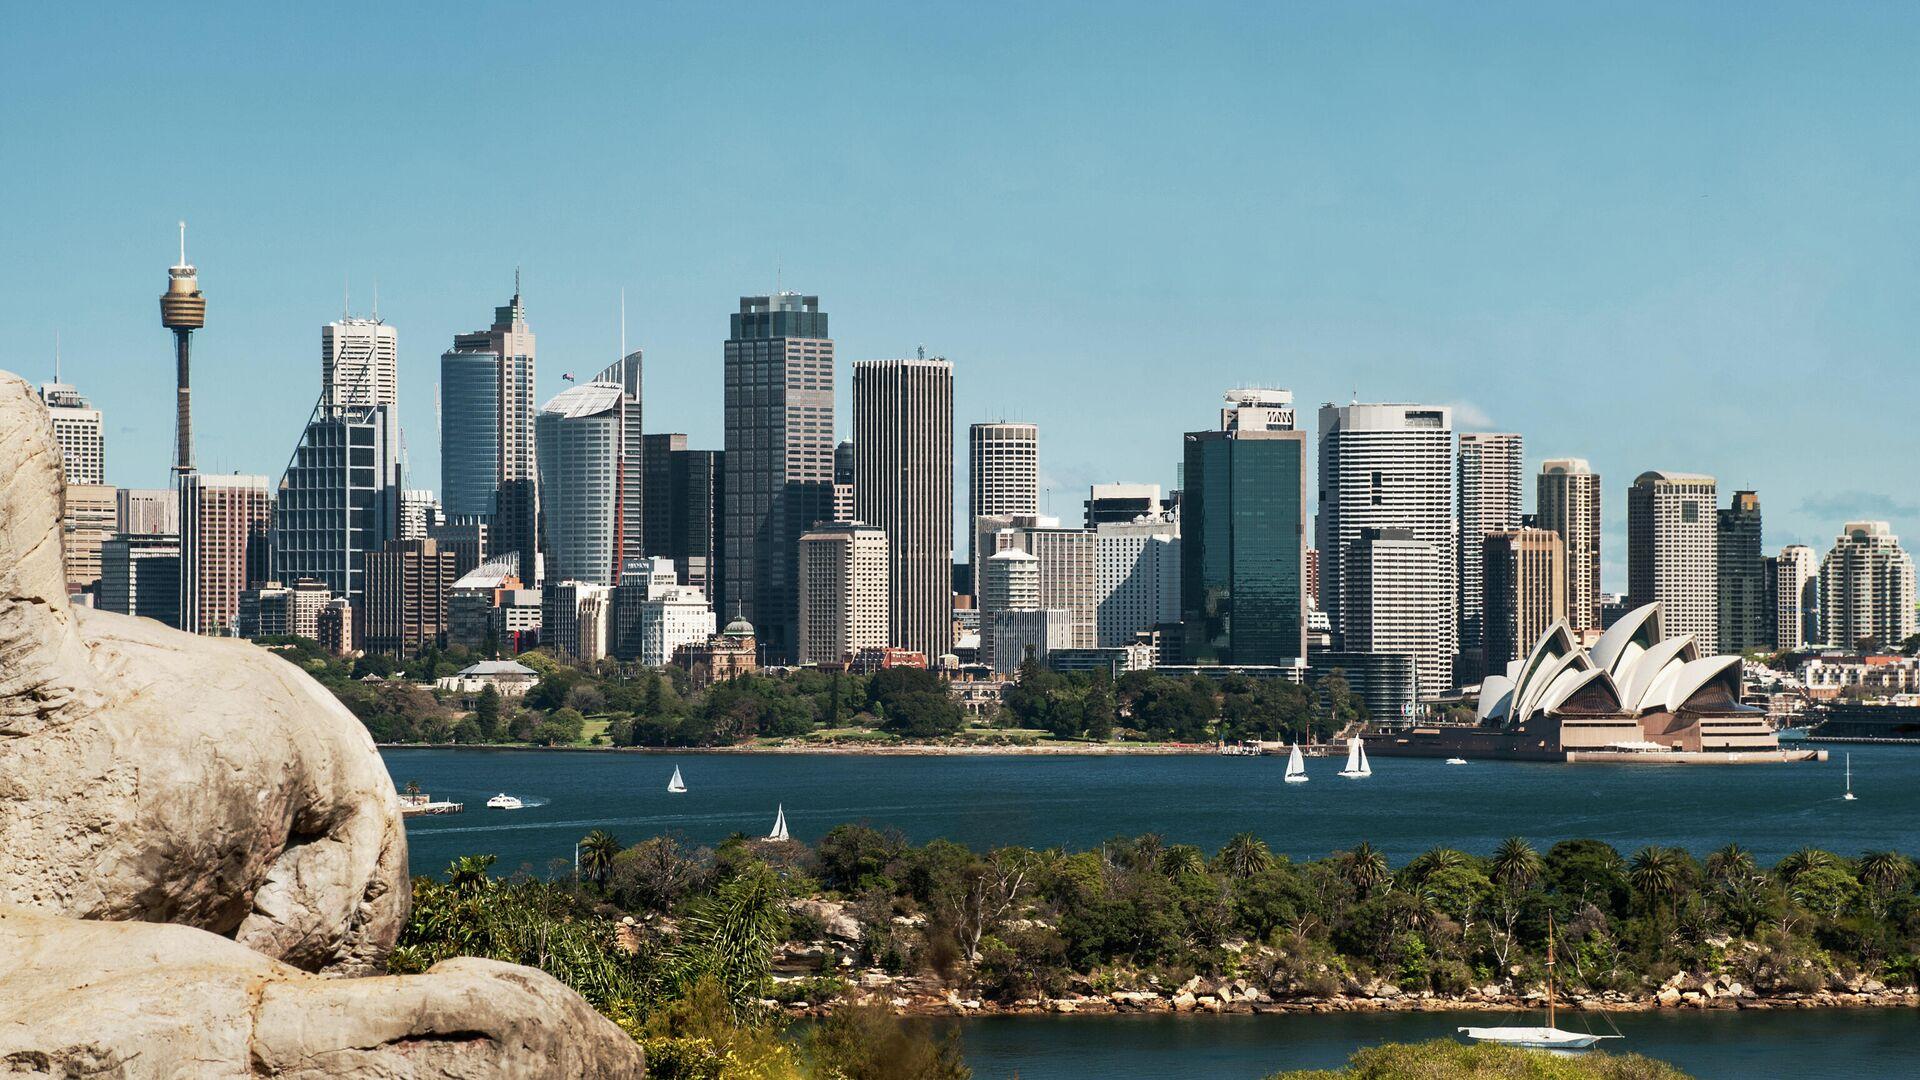 Сидней, Австралия - РИА Новости, 1920, 18.09.2021